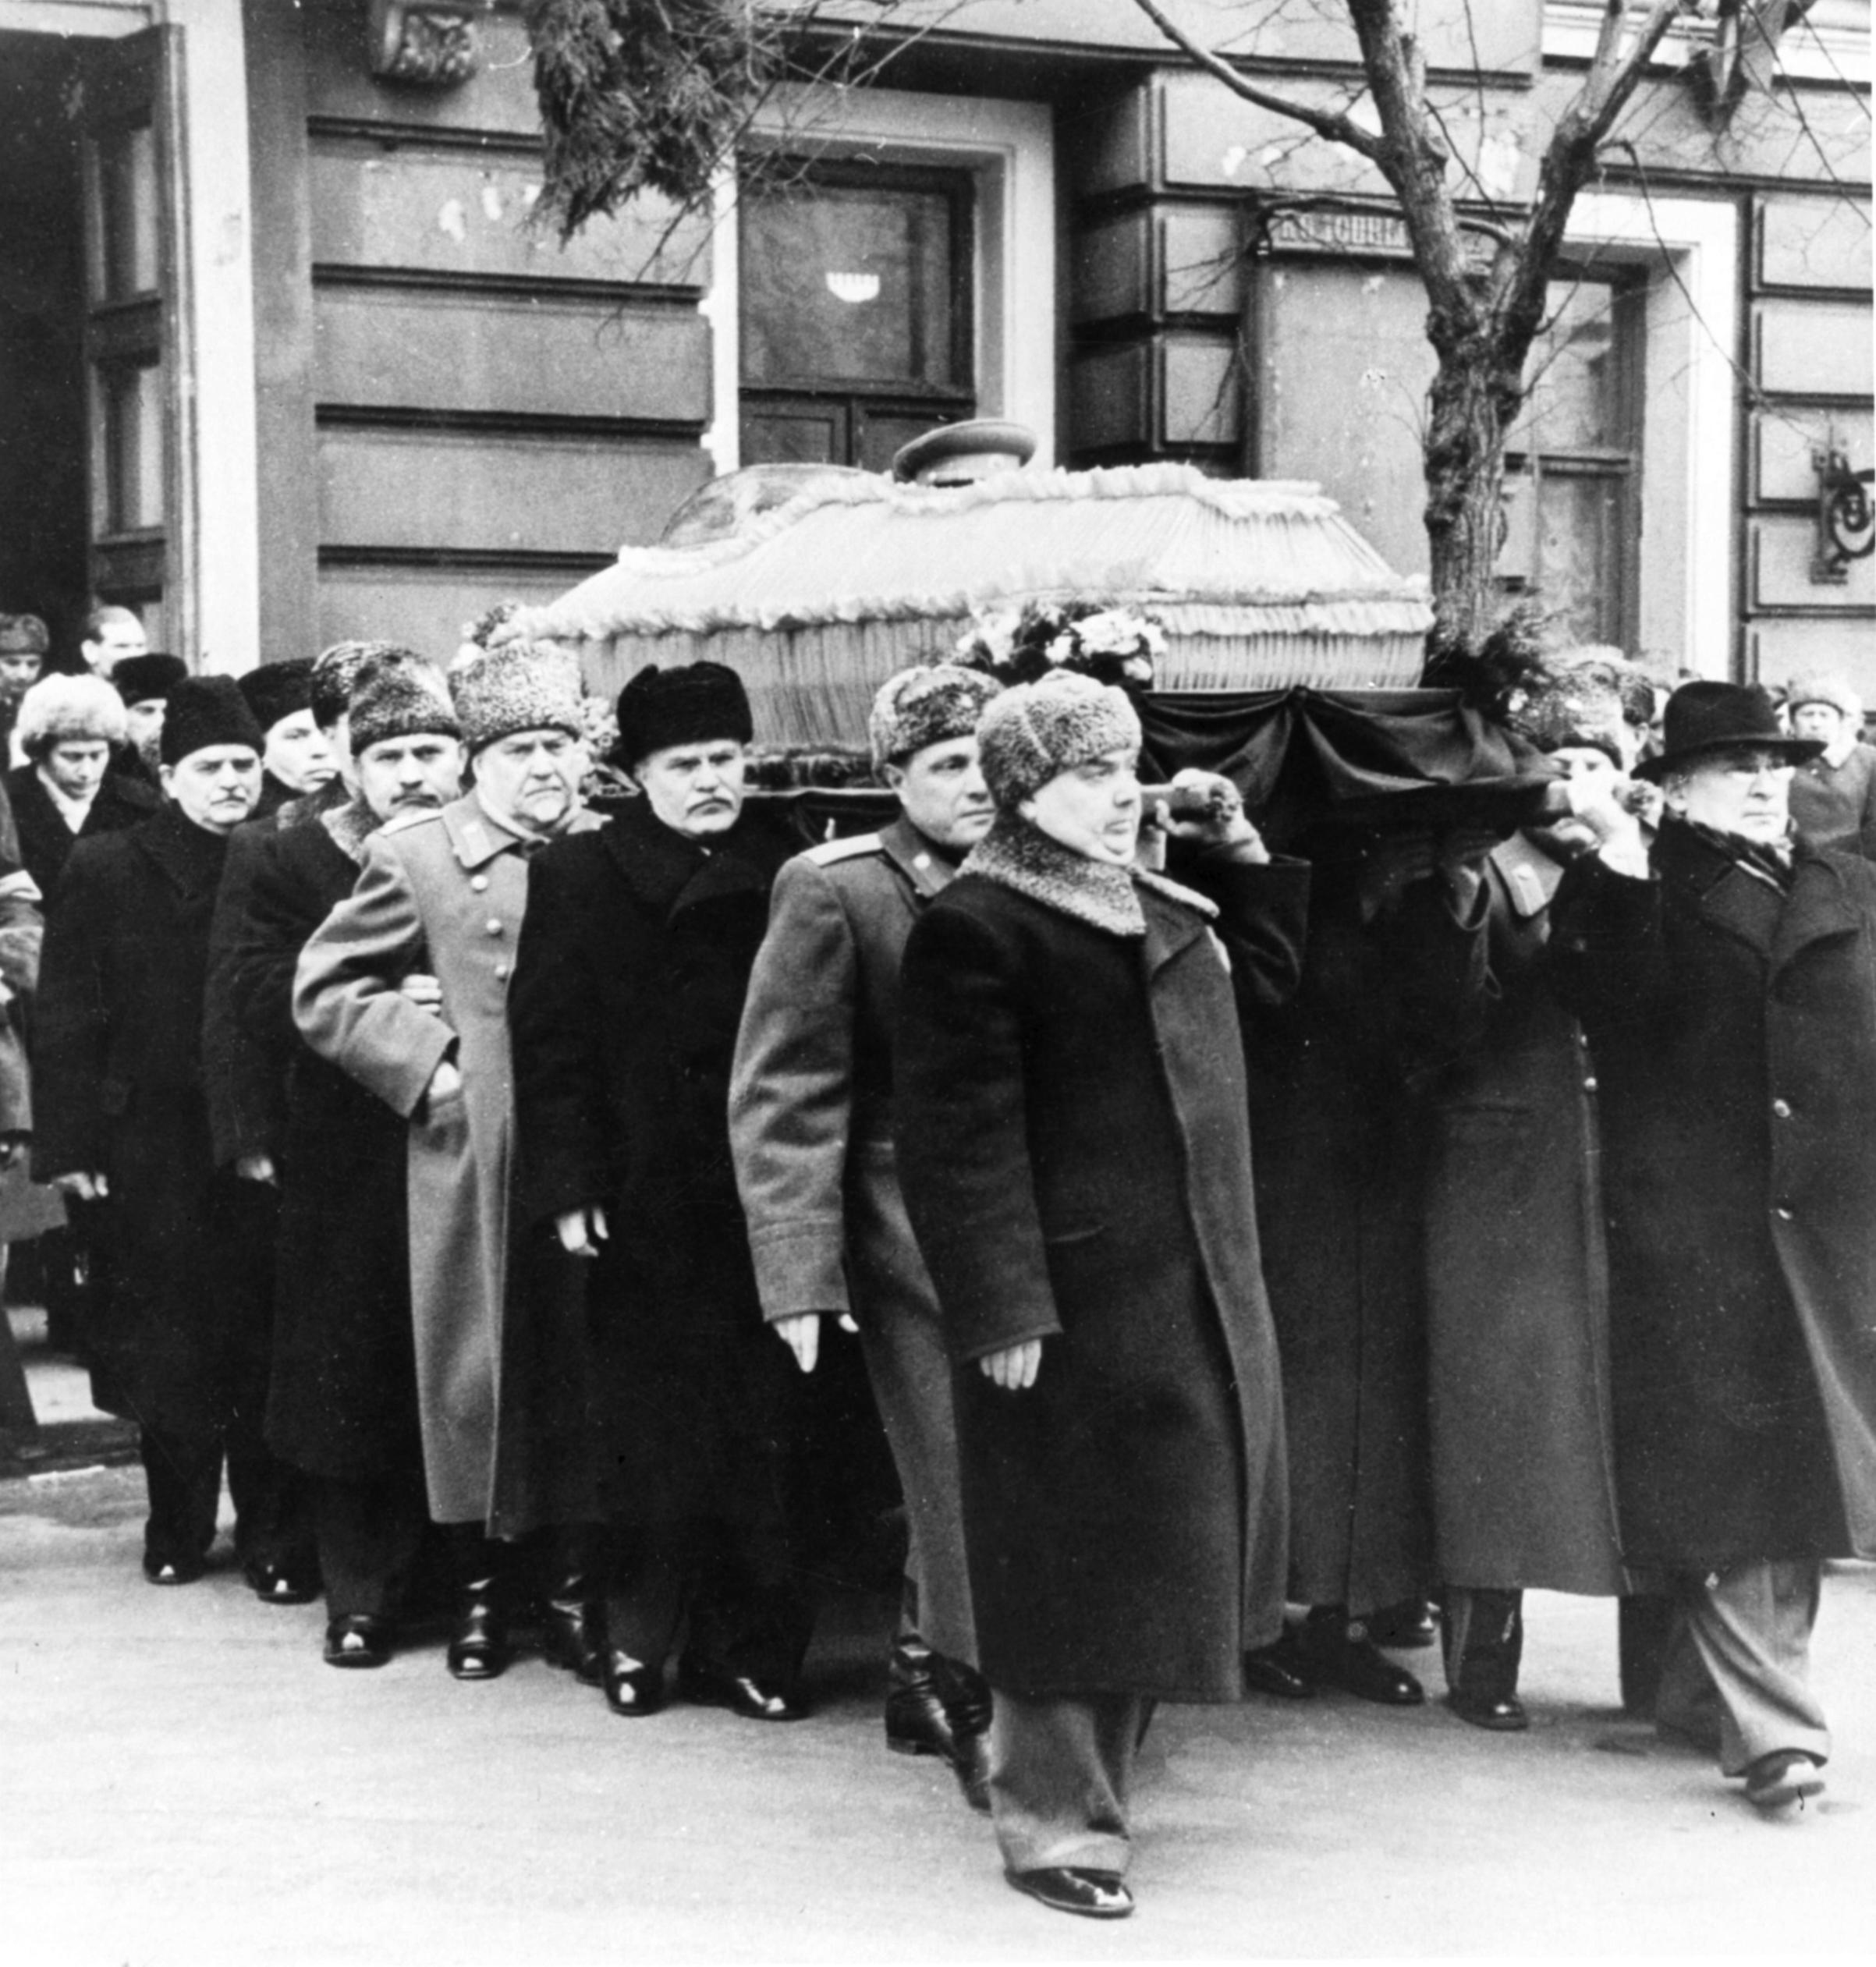 Armando Iannucci The Death Of Stalin Movie And Russia Ban Time